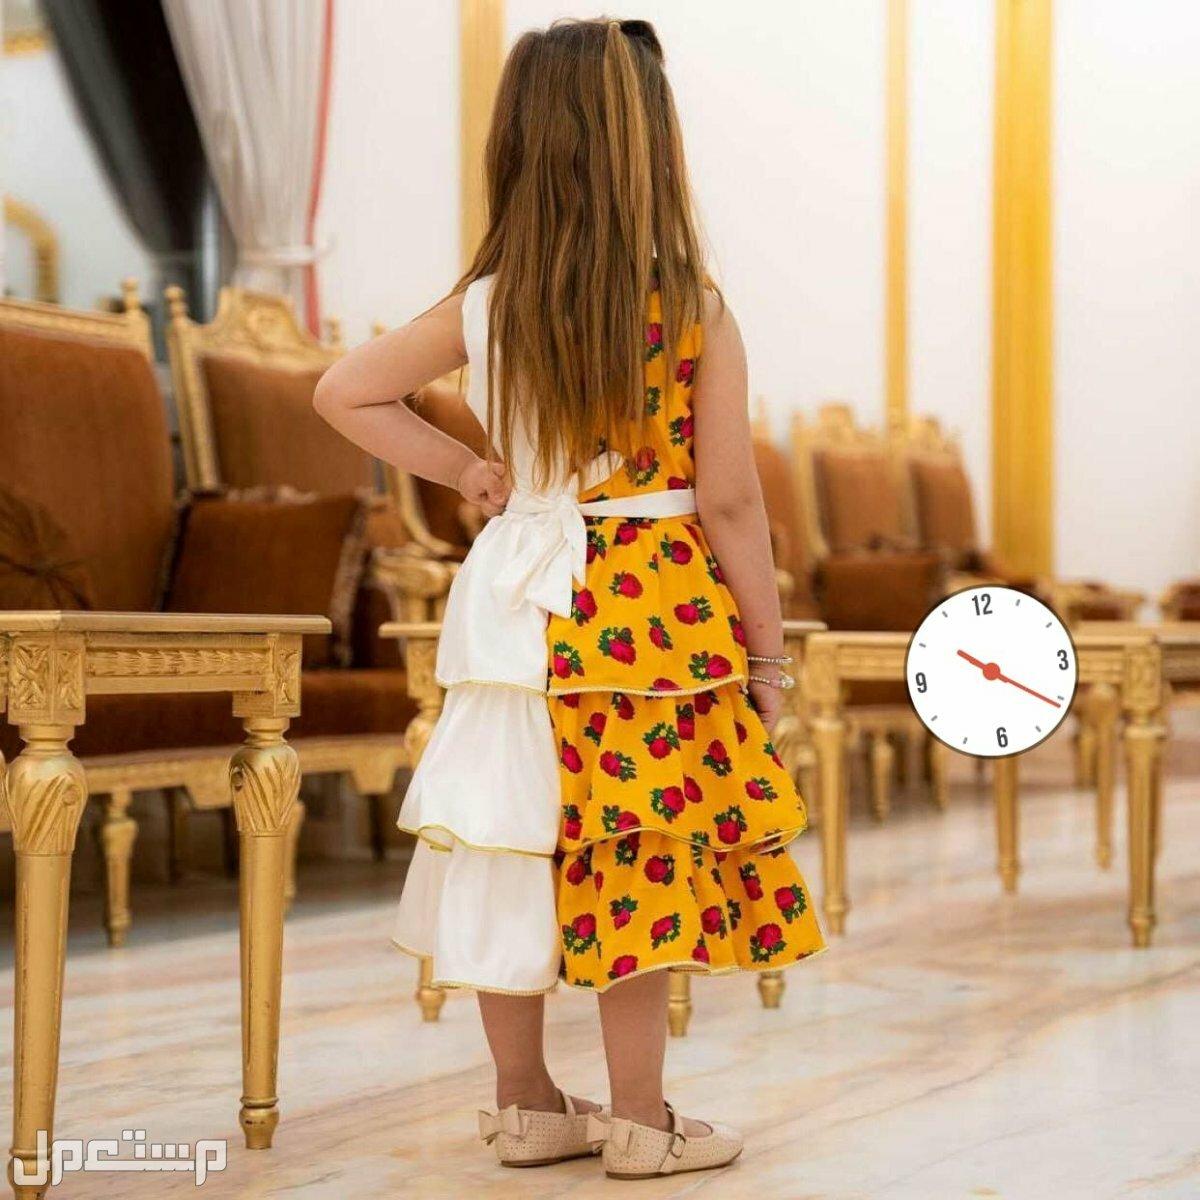 كولكشن رمضان والعيد # فساتين بناتي بالاسم تطريز فاخر